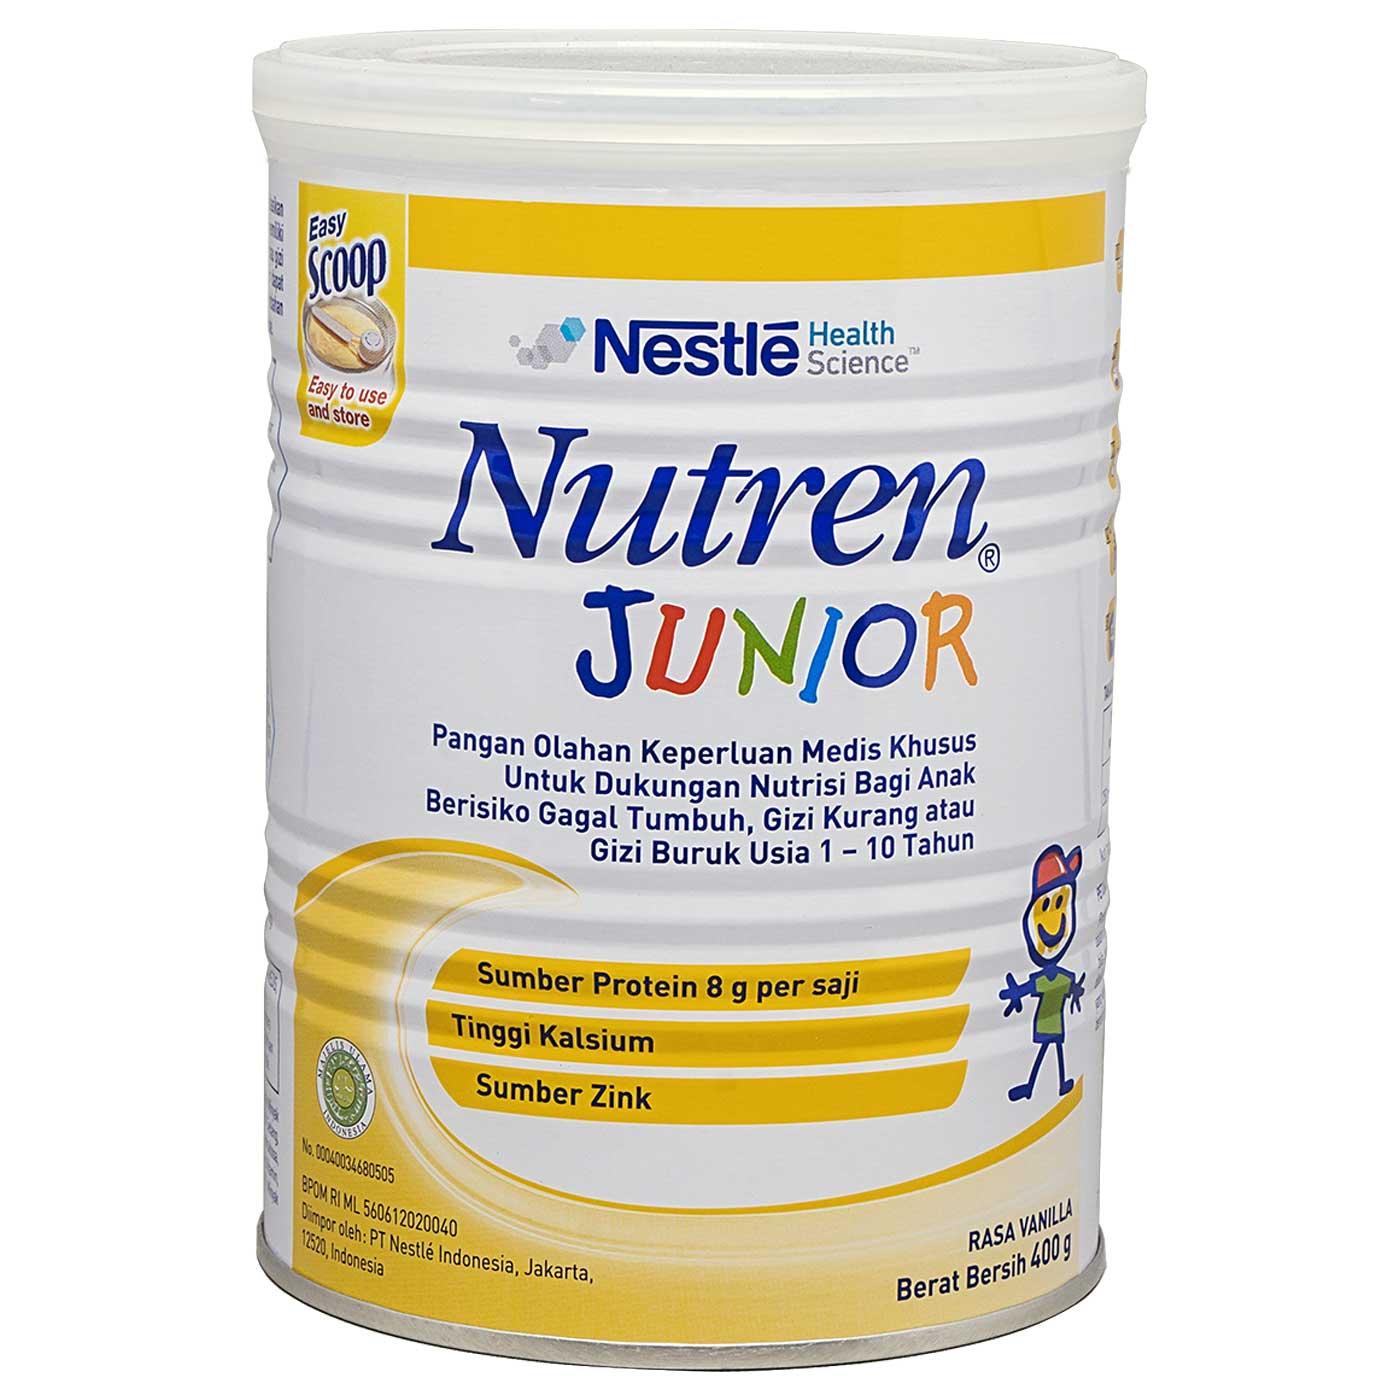 Nutren Junior Prebio 1 ACB003 400g N5